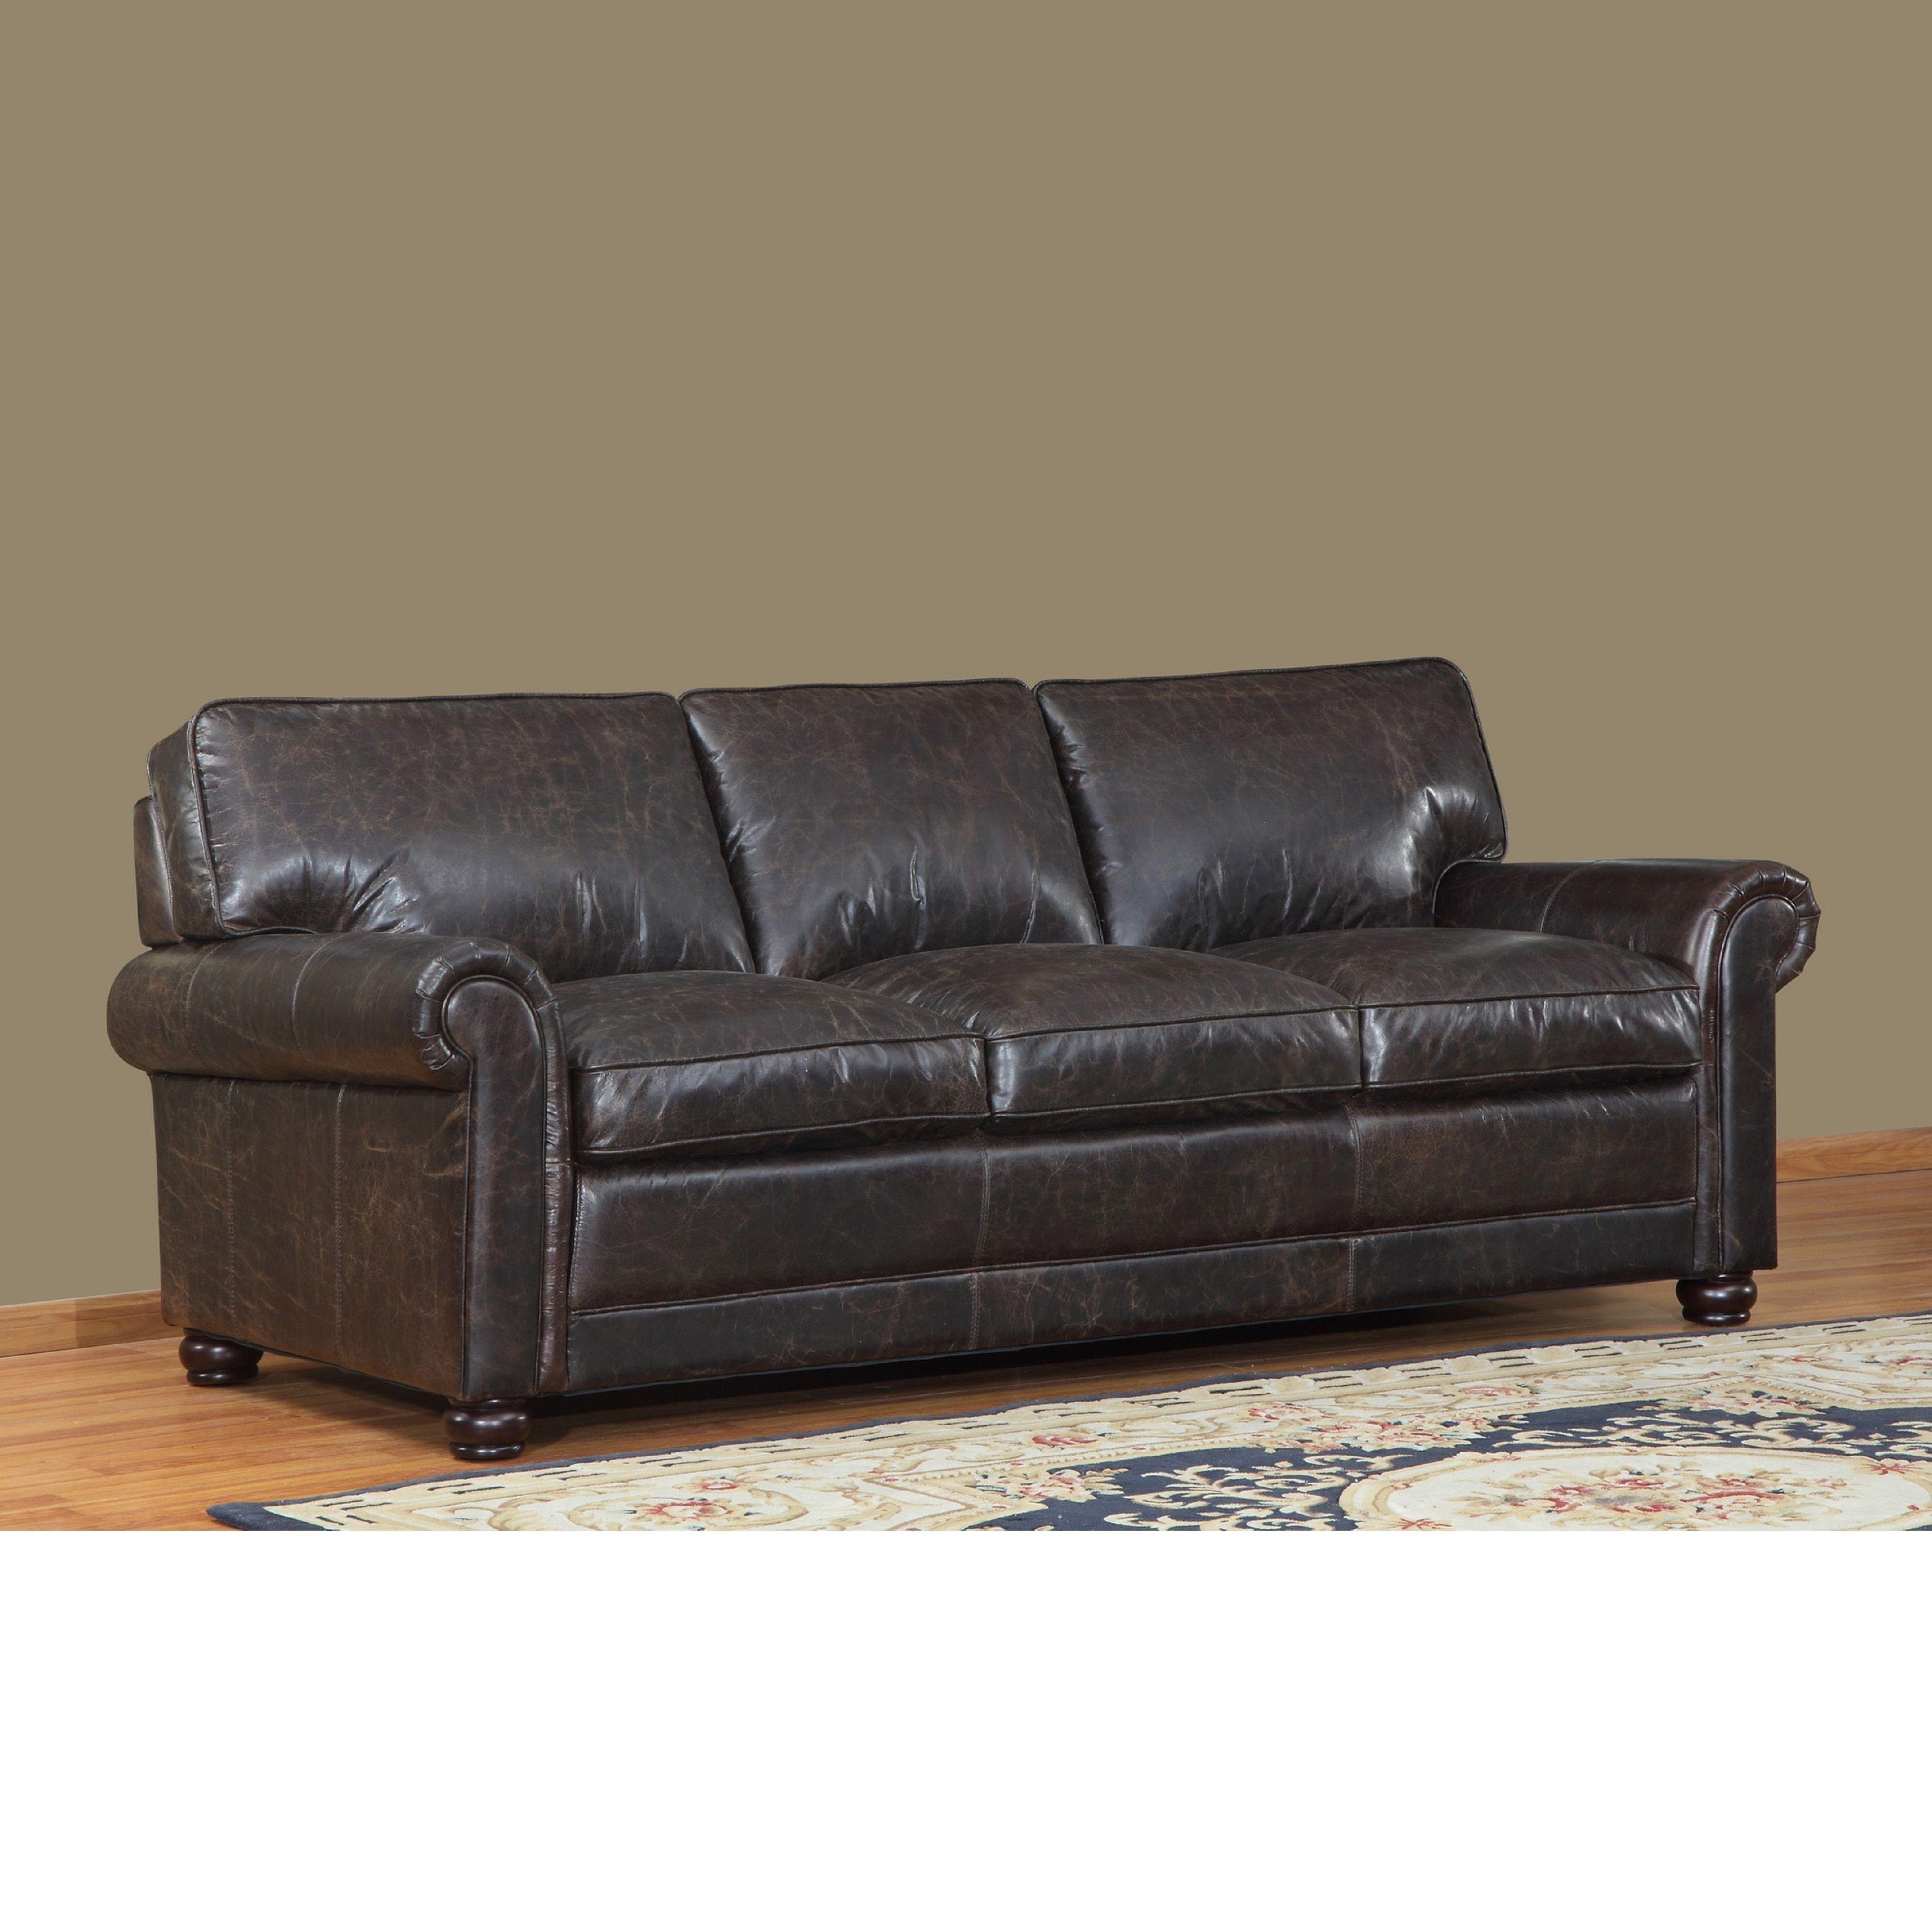 Genesis Brown Leather Cowhide Sofa Brown Leather Sofa with Bun Feet